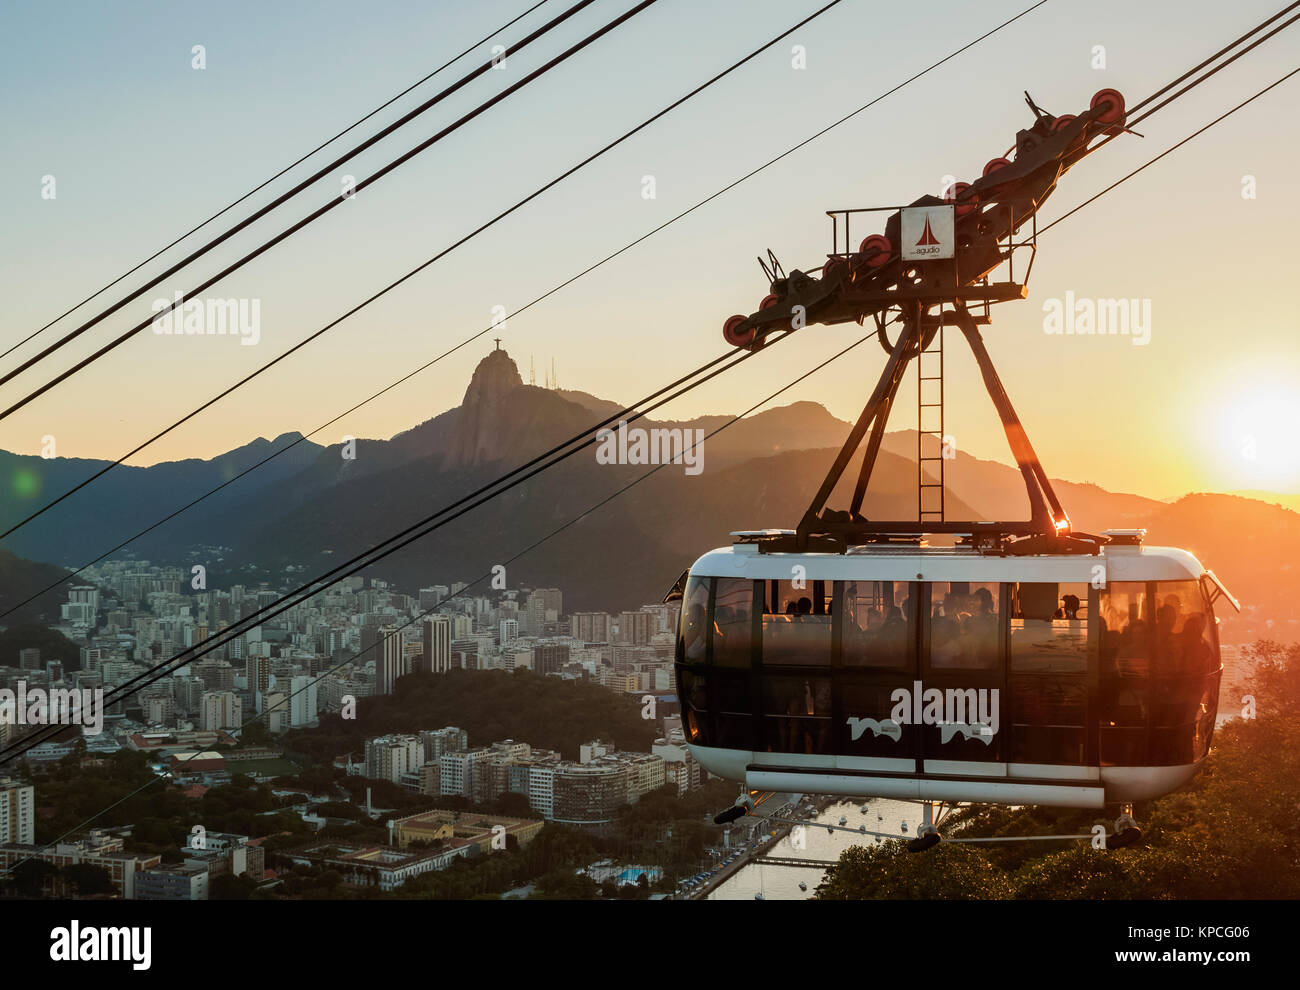 Cable Car to Morro da Urca and Sugarloaf Mountain at sunset, Rio de Janeiro, Brazil Stock Photo